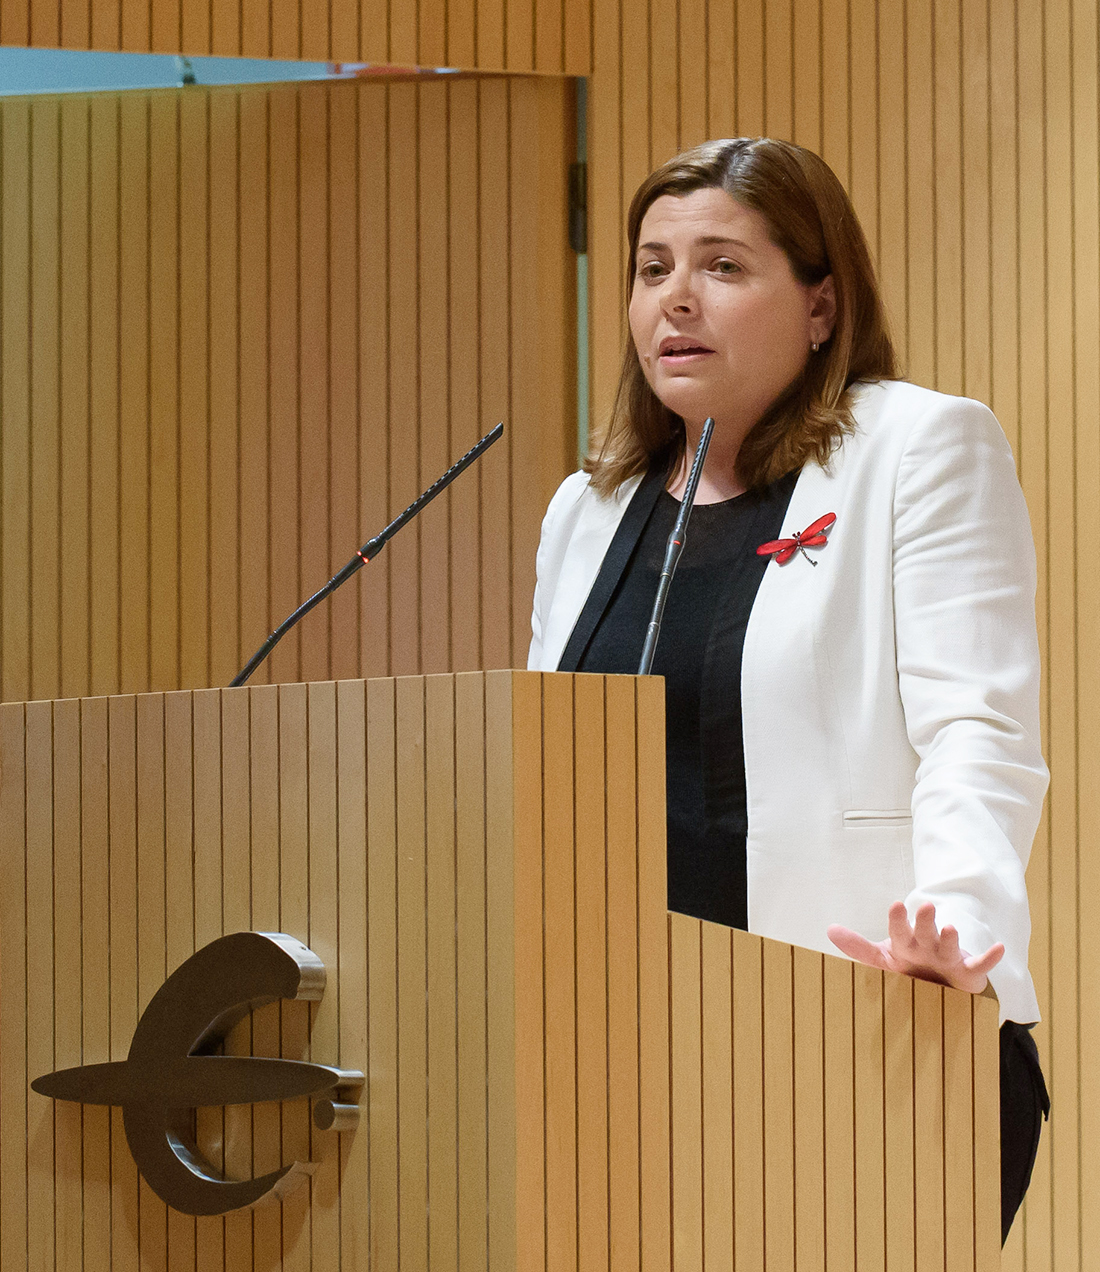 Elena García-Lechuz received the prize from the Marta Gastón